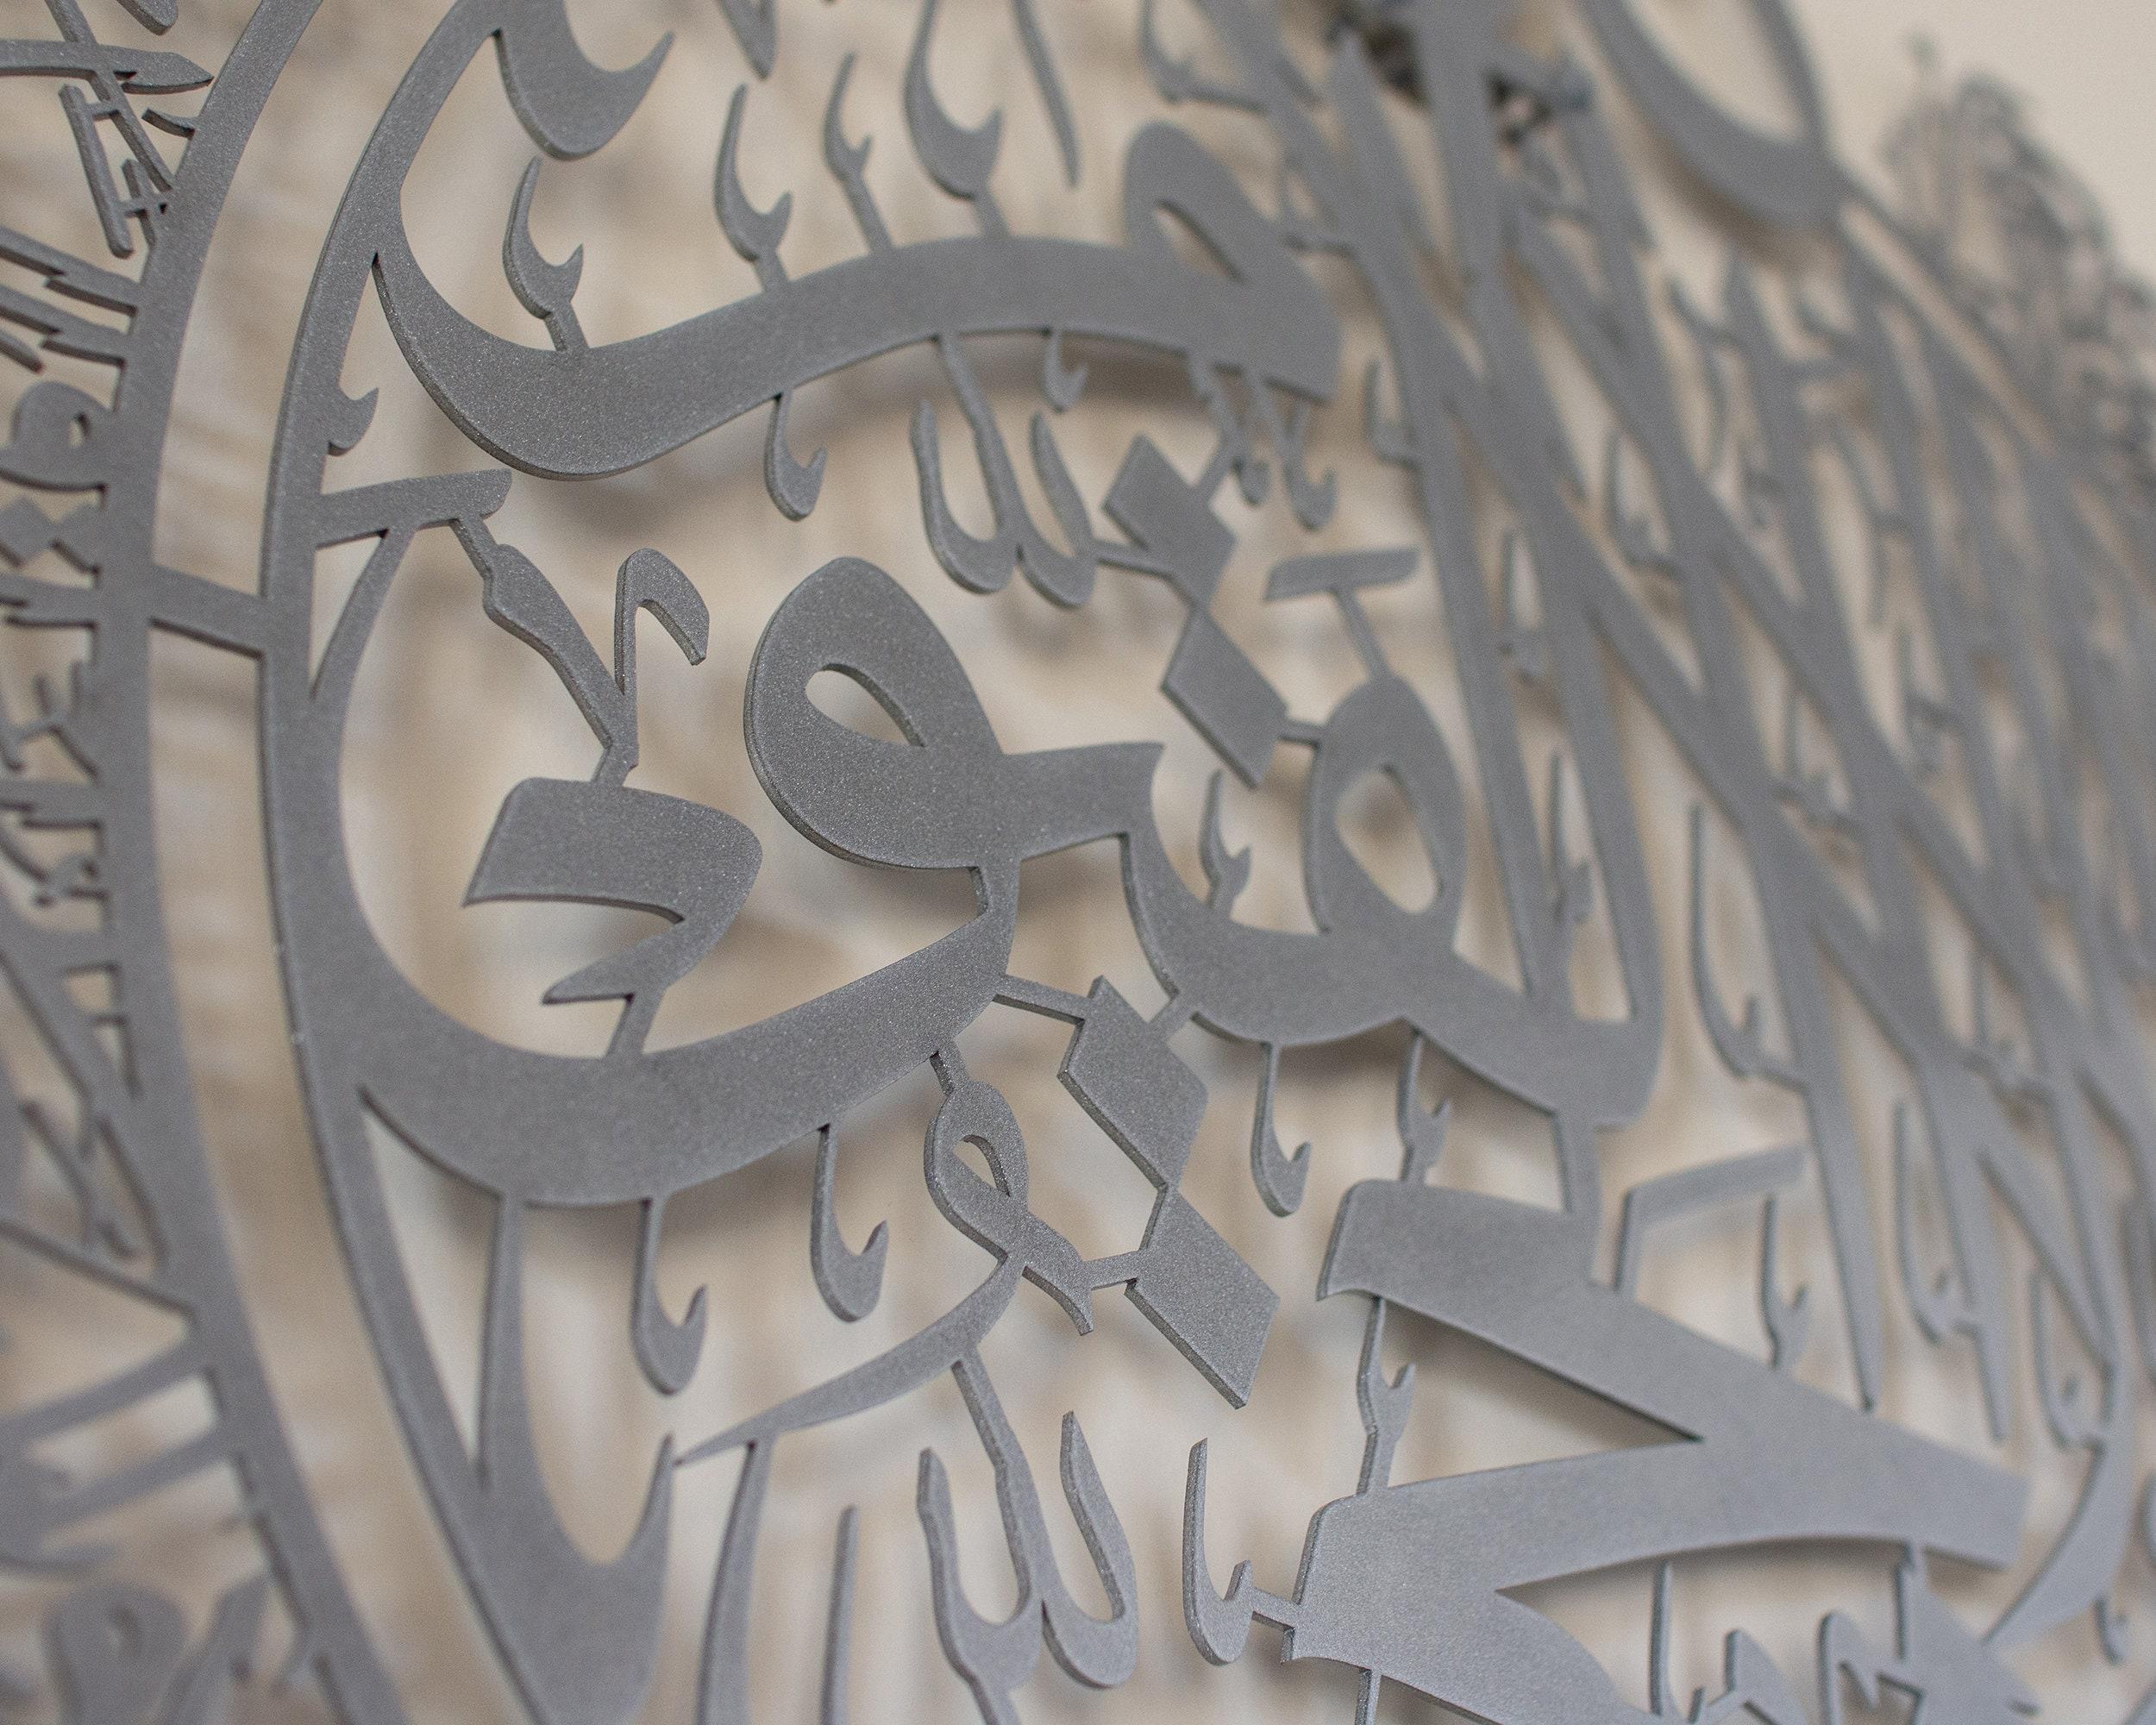 Metal Large Ayatul Kursi Wall Art Islamic Wall Art Calligraphy Matte Black Gold Copper Muslim Housewarming Gift And Home Decor